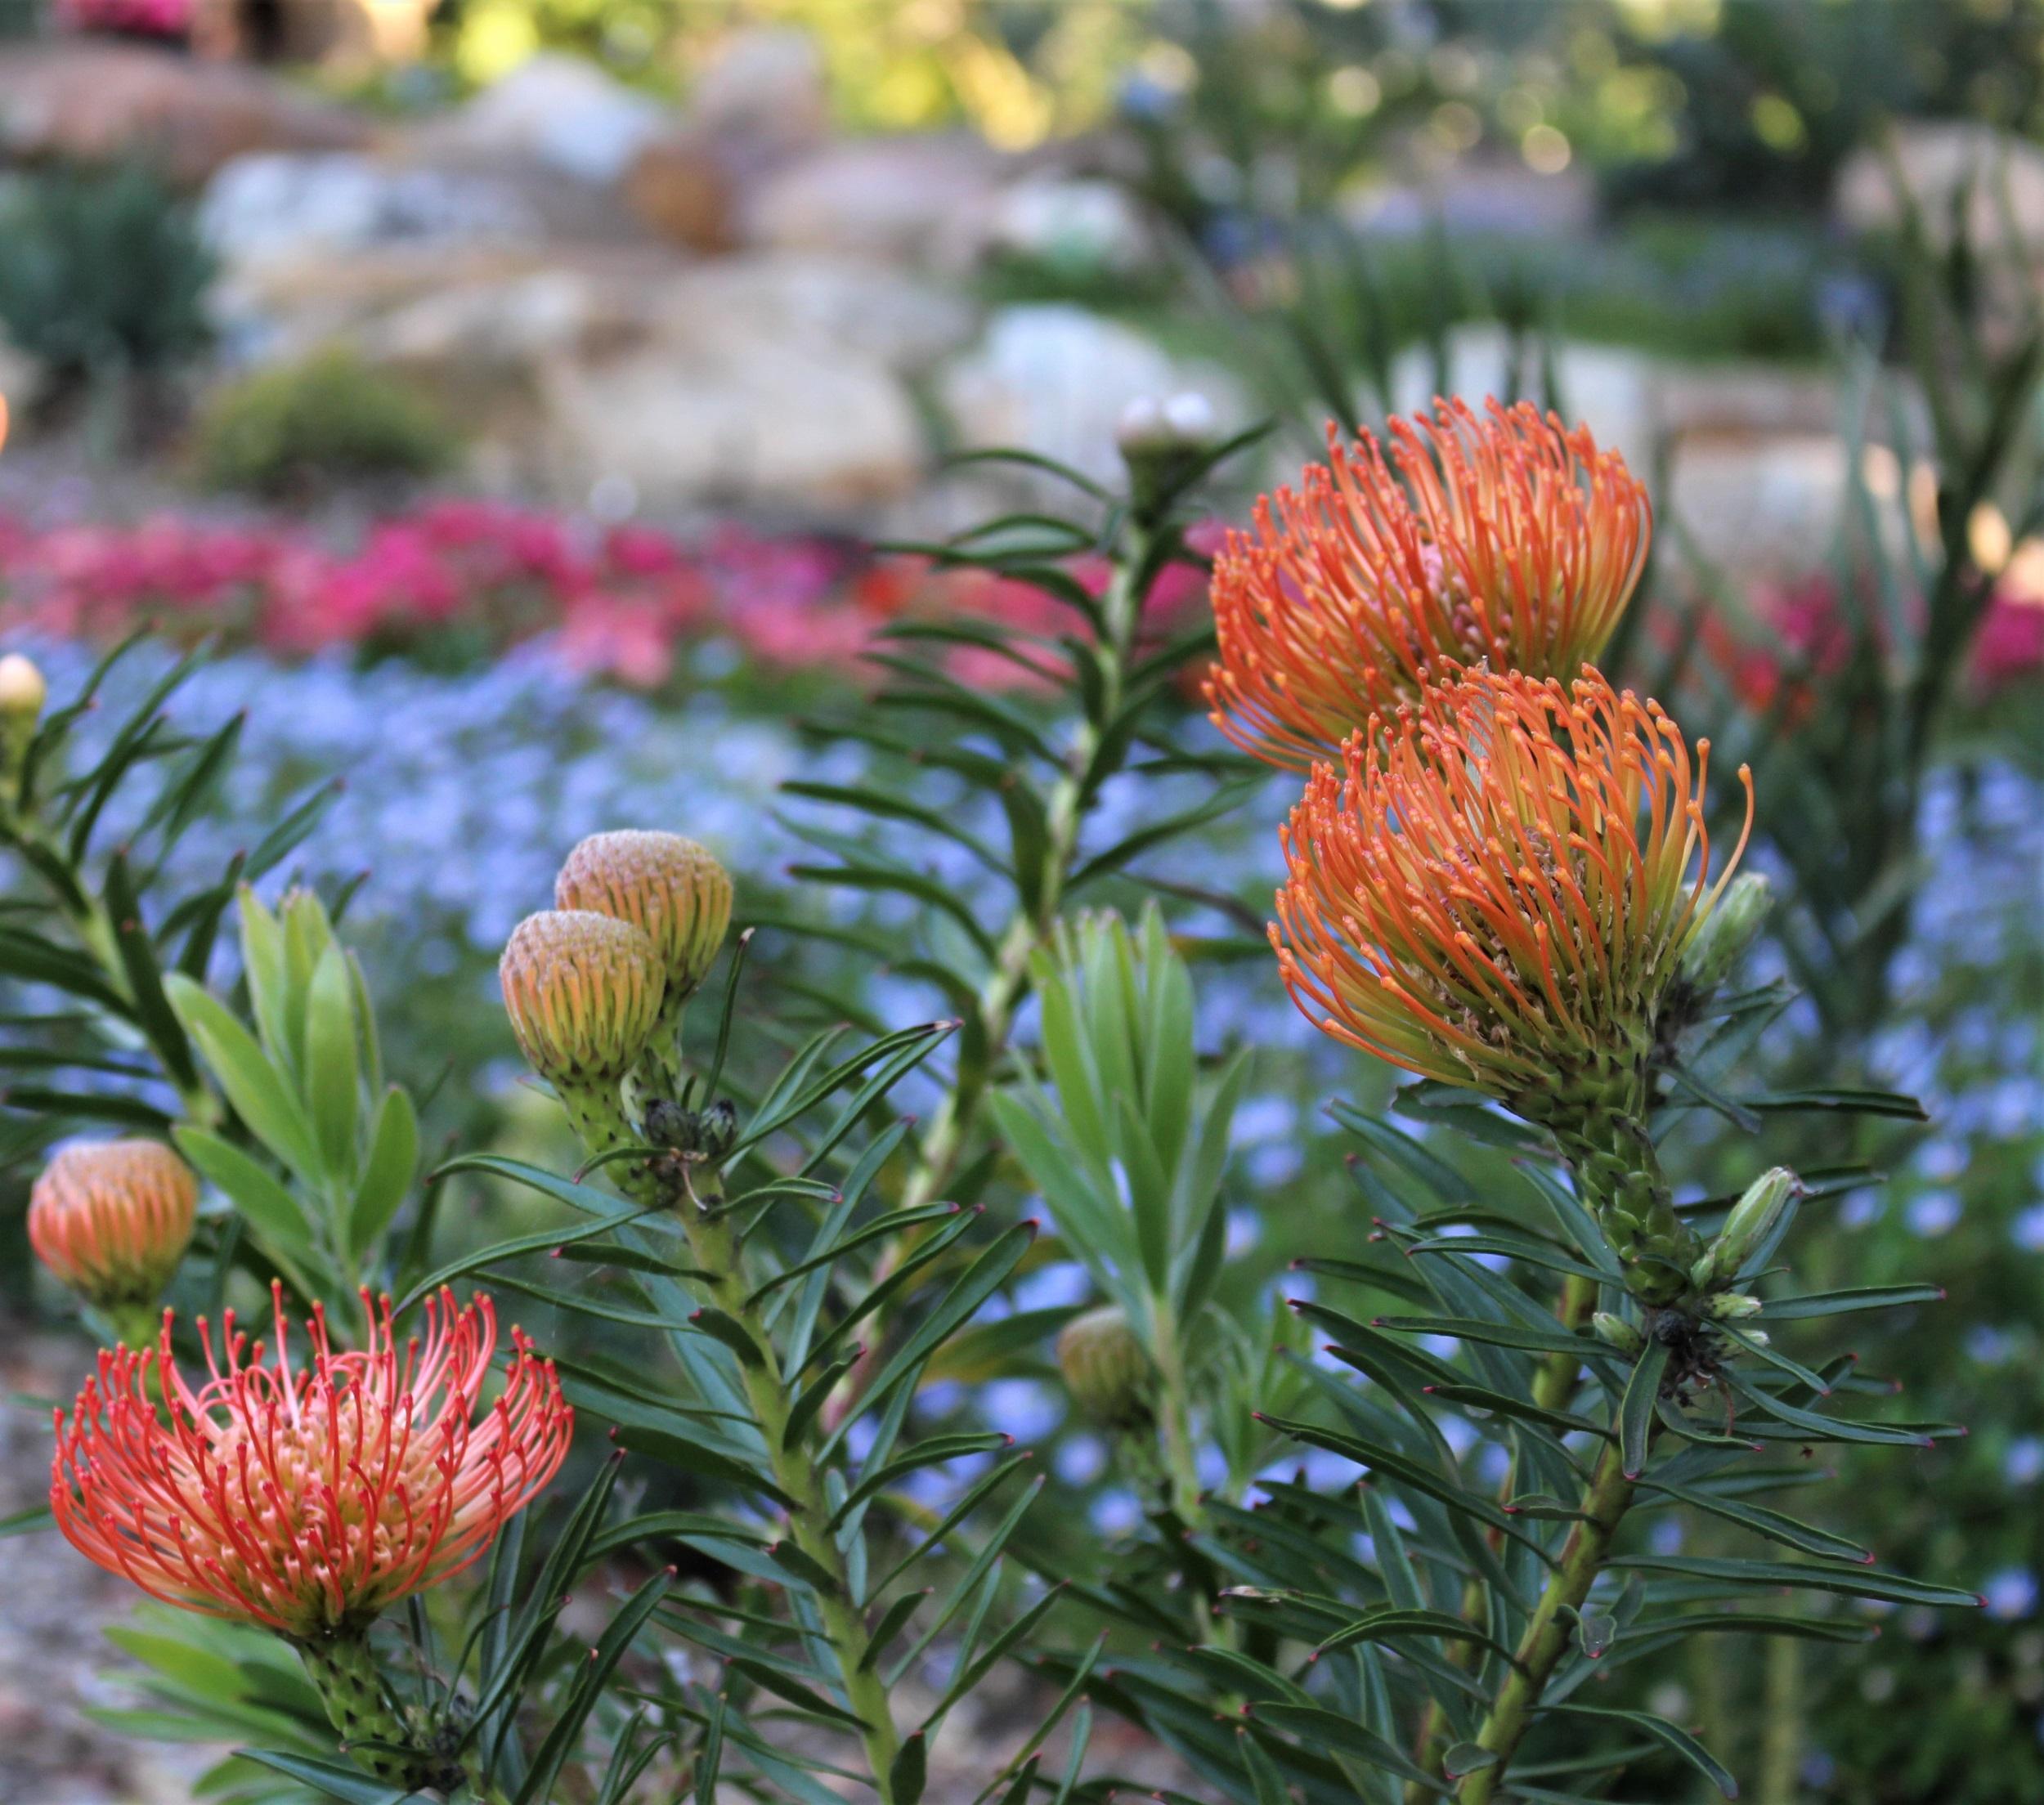 Southern African Garden